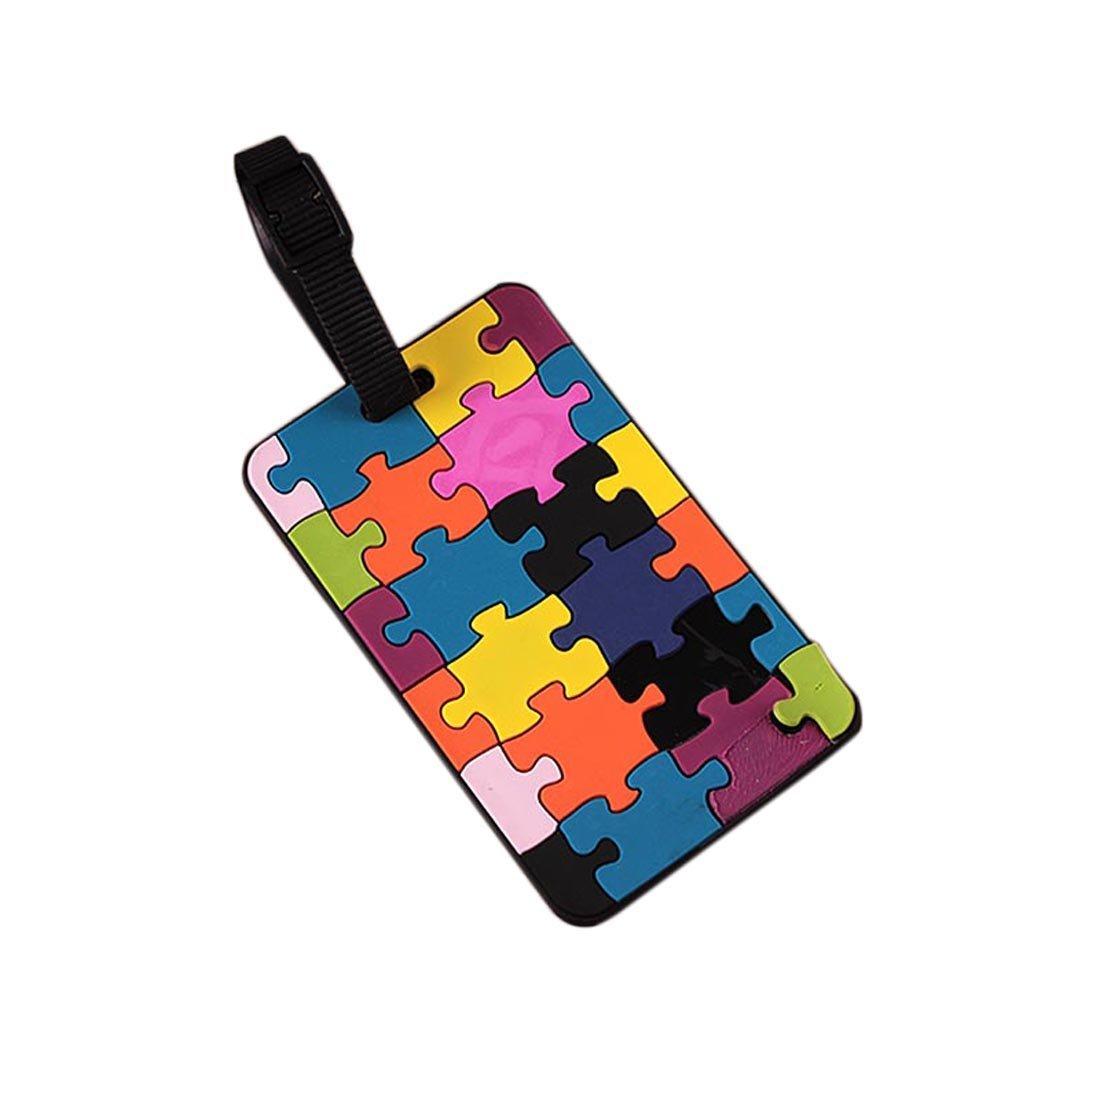 Fullkang Jigsaw Portable Secure Travel Suitcase ID Luggage Handbag Large Tag Label (#02)